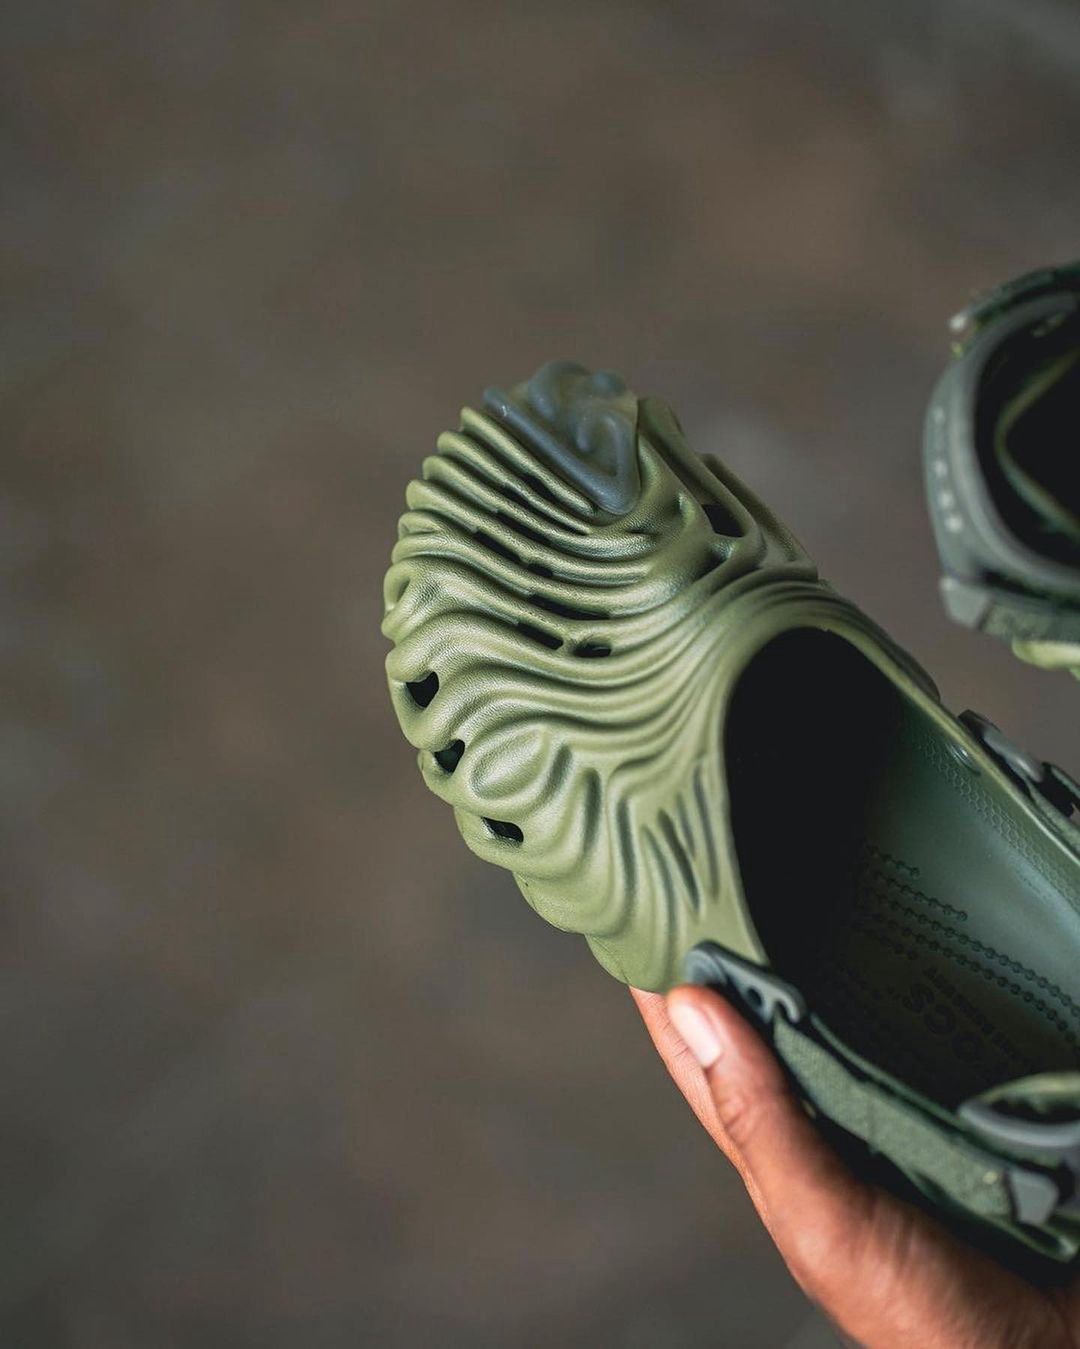 Salehe Bembury,Crocs  看到别说不认识!Crocs「怪异」联名最新实物曝光!